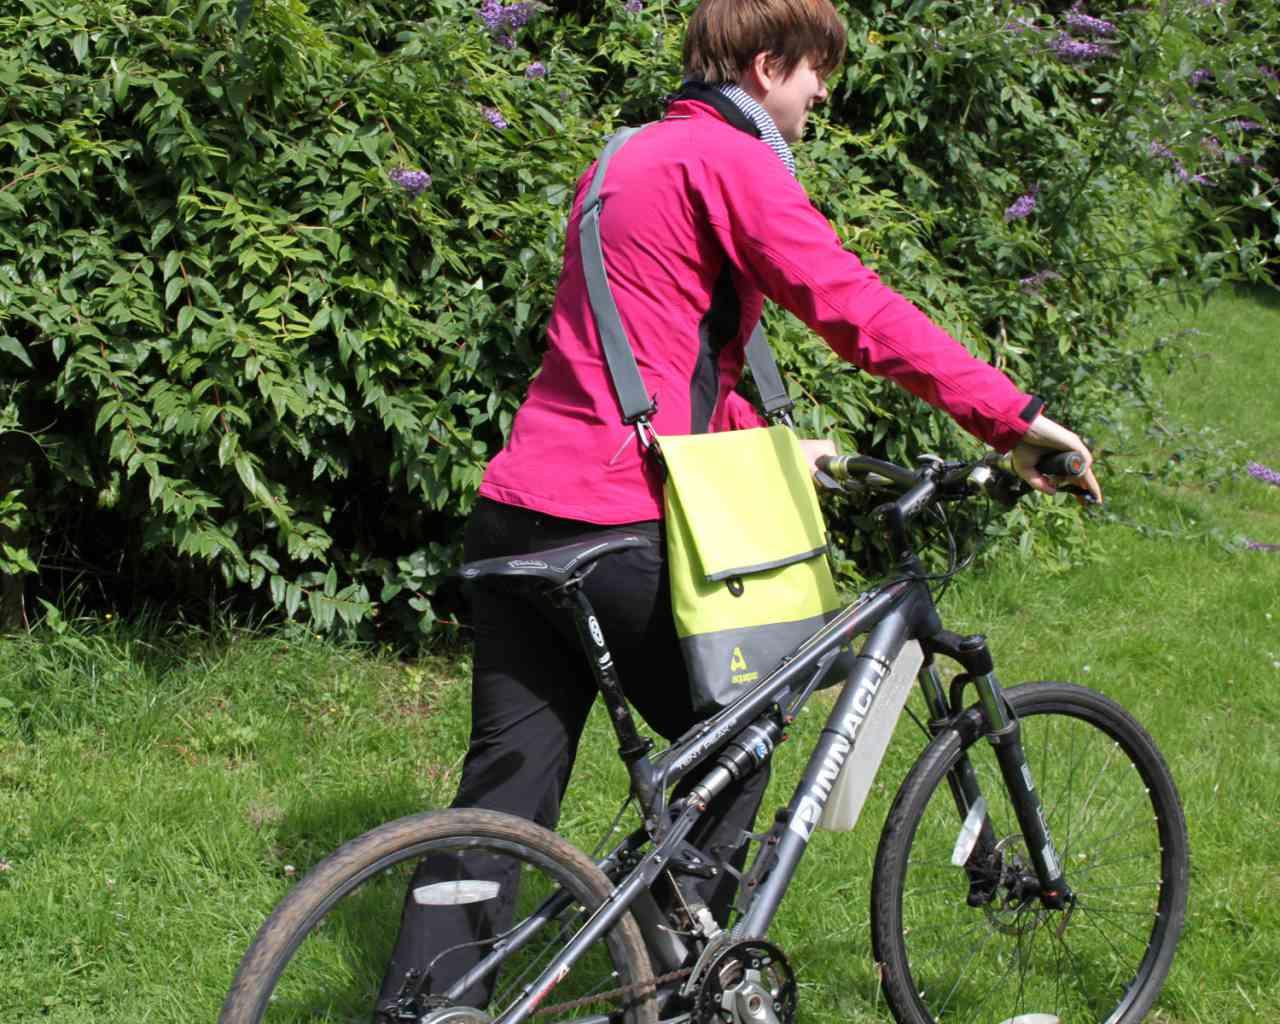 Брызгозащитная сумка Aquapac 053 - TrailProof™ Tote Bag – Large.. Aquapac - №1 в мире водонепроницаемых чехлов и сумок. Фото 3